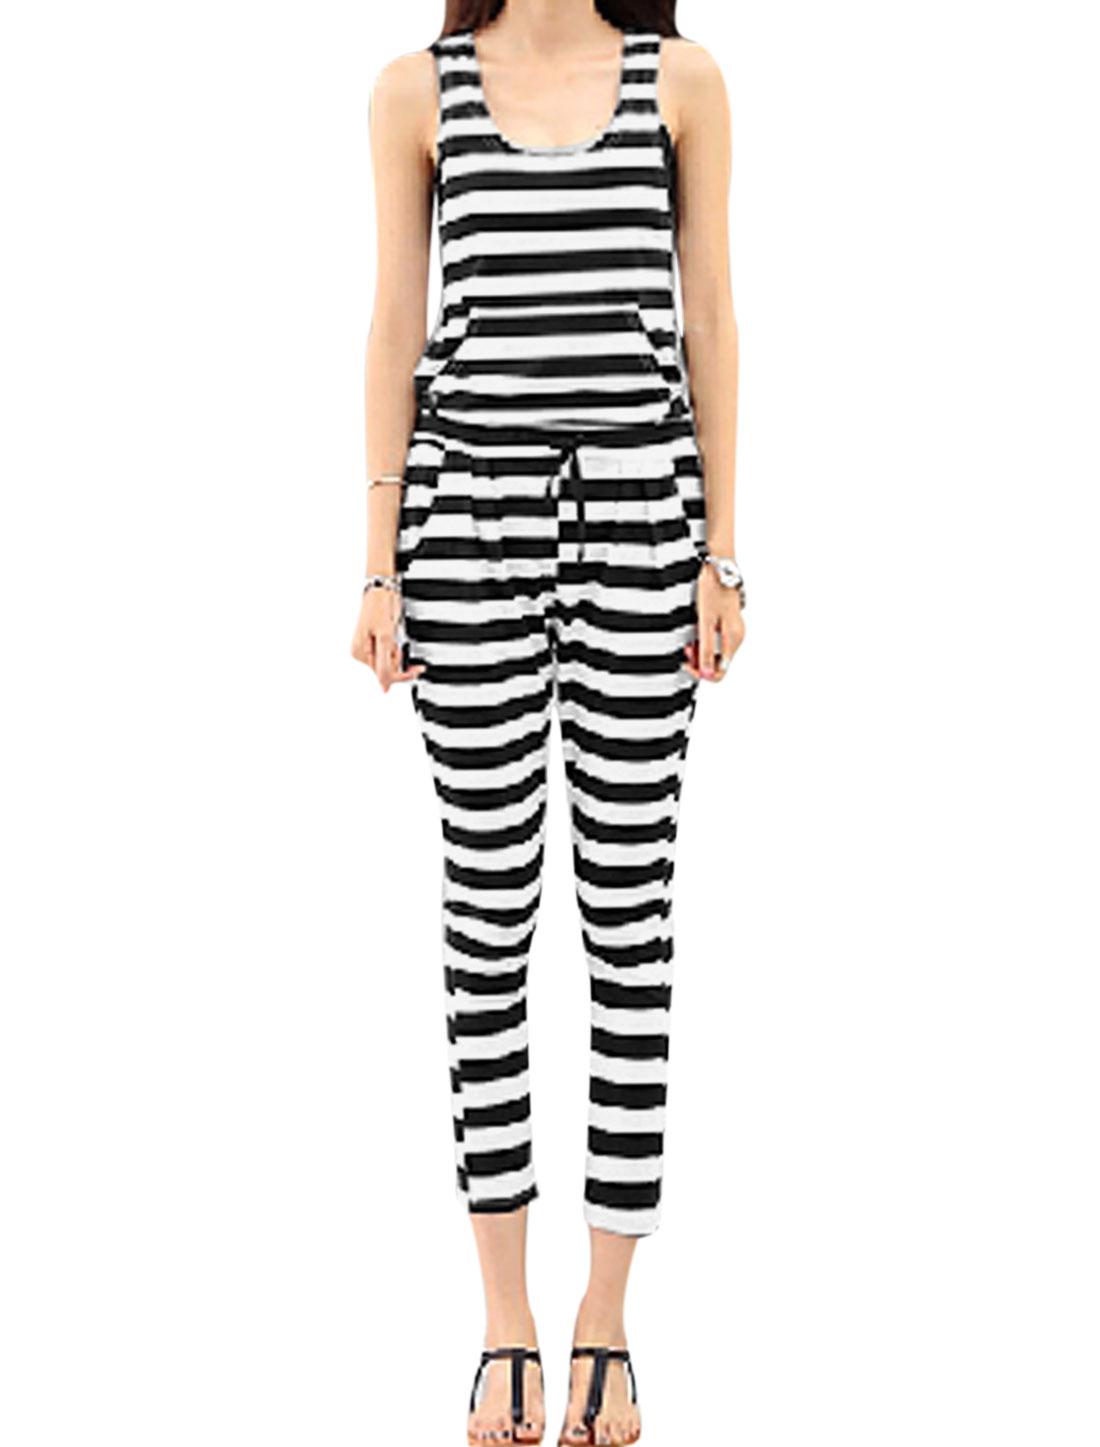 Women Stripes Sleeveless Kangaroo Pocket Front Drawstring Waist Jumpsuit Black White S